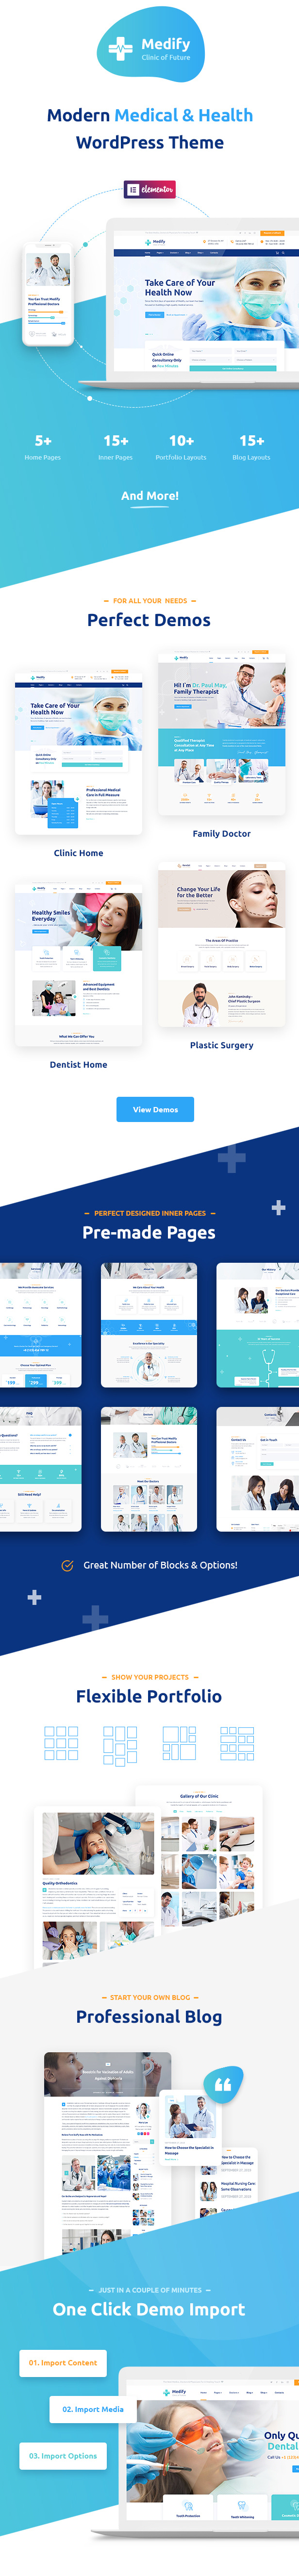 Medify - Health & Clinic WordPress Theme - 2